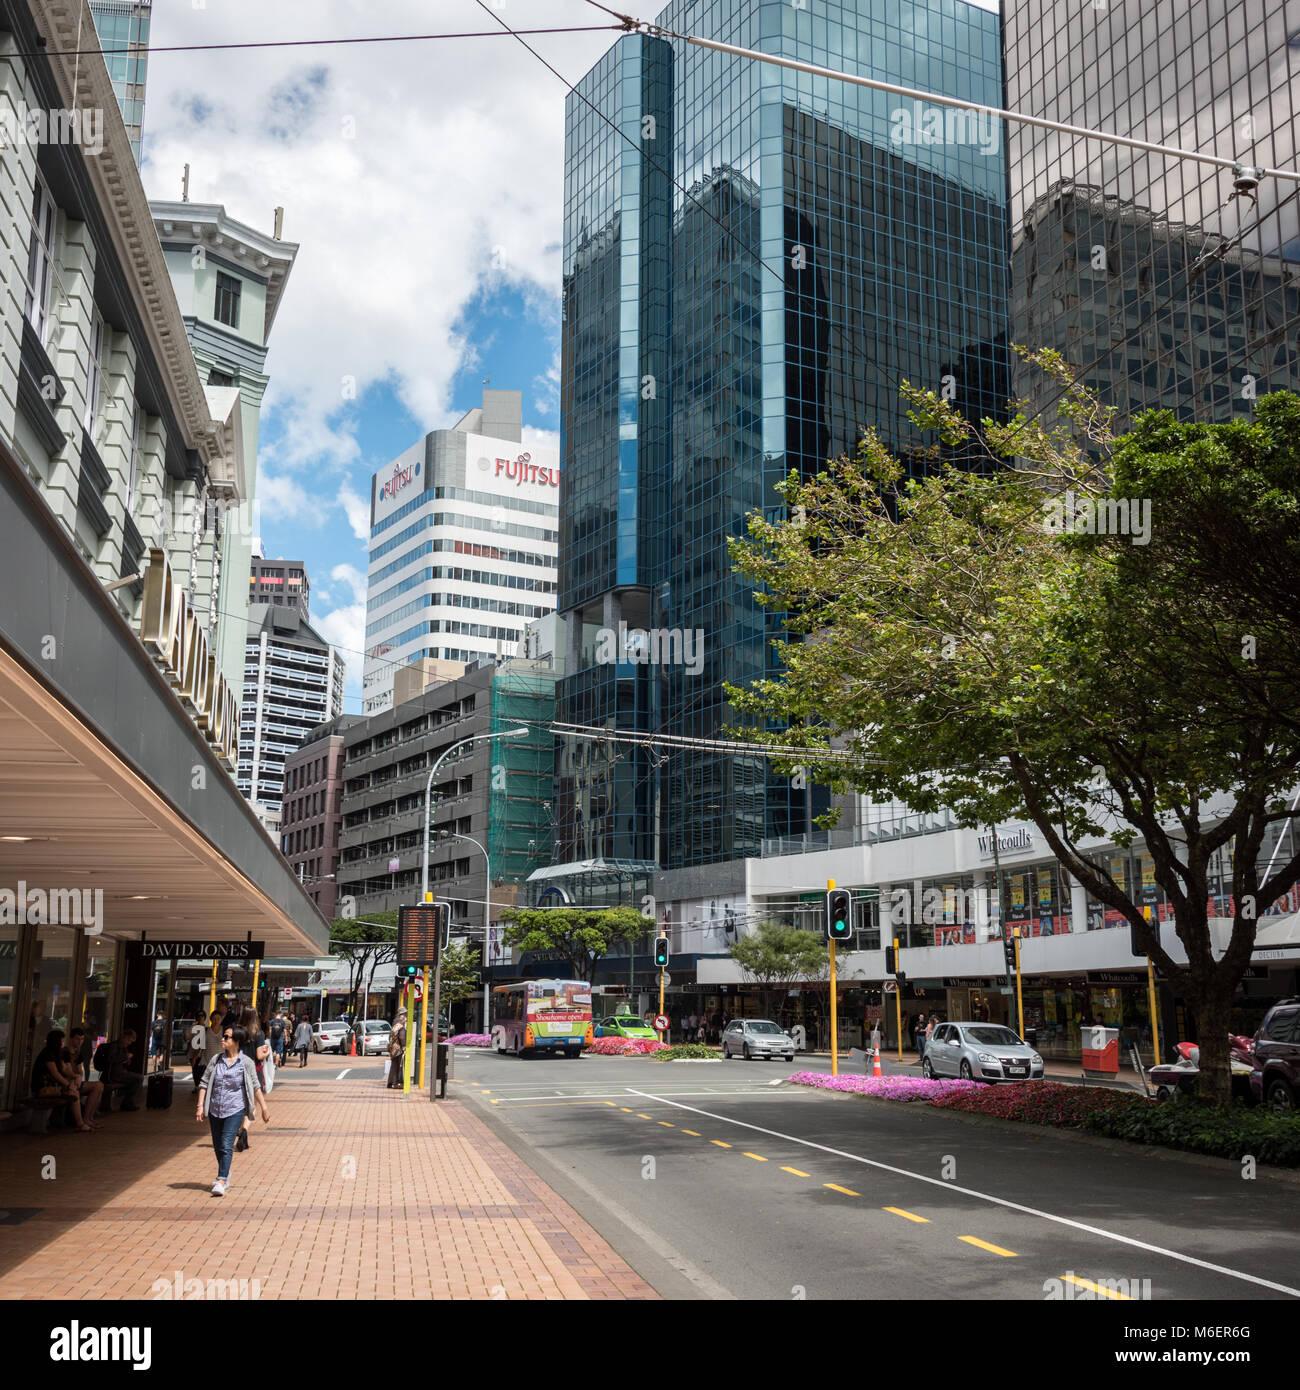 Central Wellington, North Island, New Zealand - Stock Image